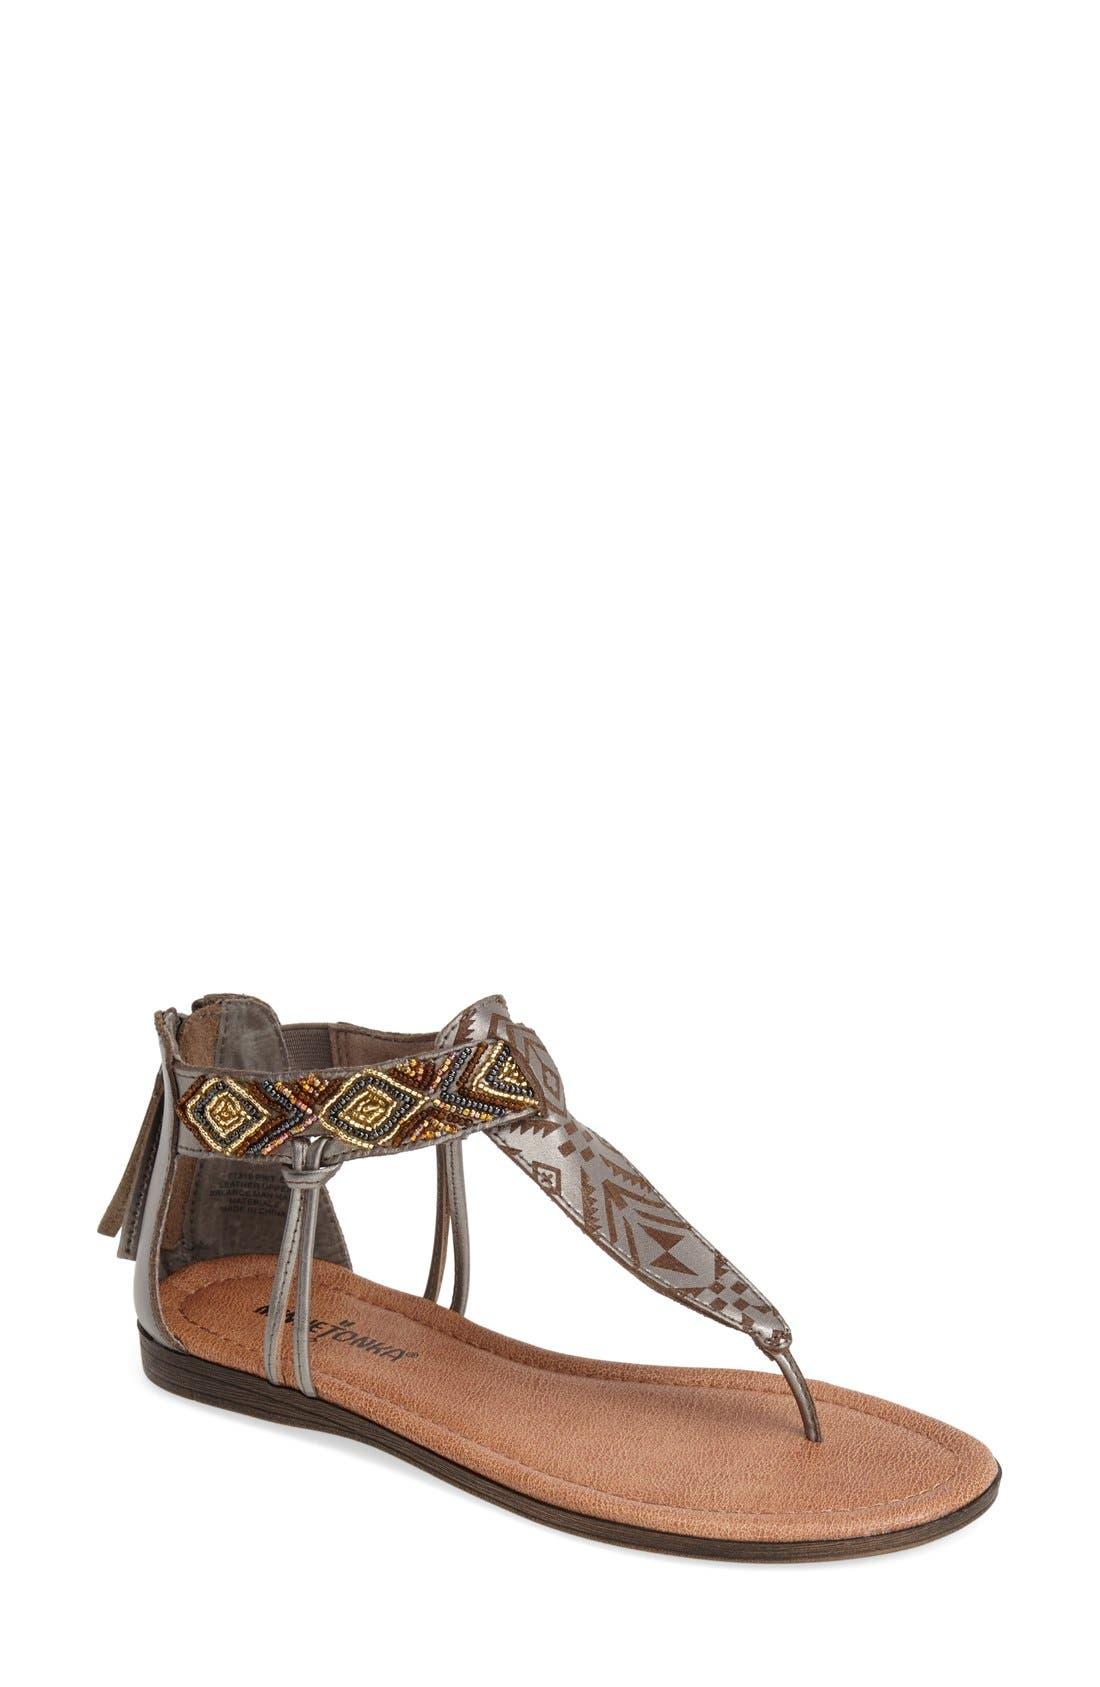 Main Image - Minnetonka 'Antigua' Beaded Thong Sandal (Women)